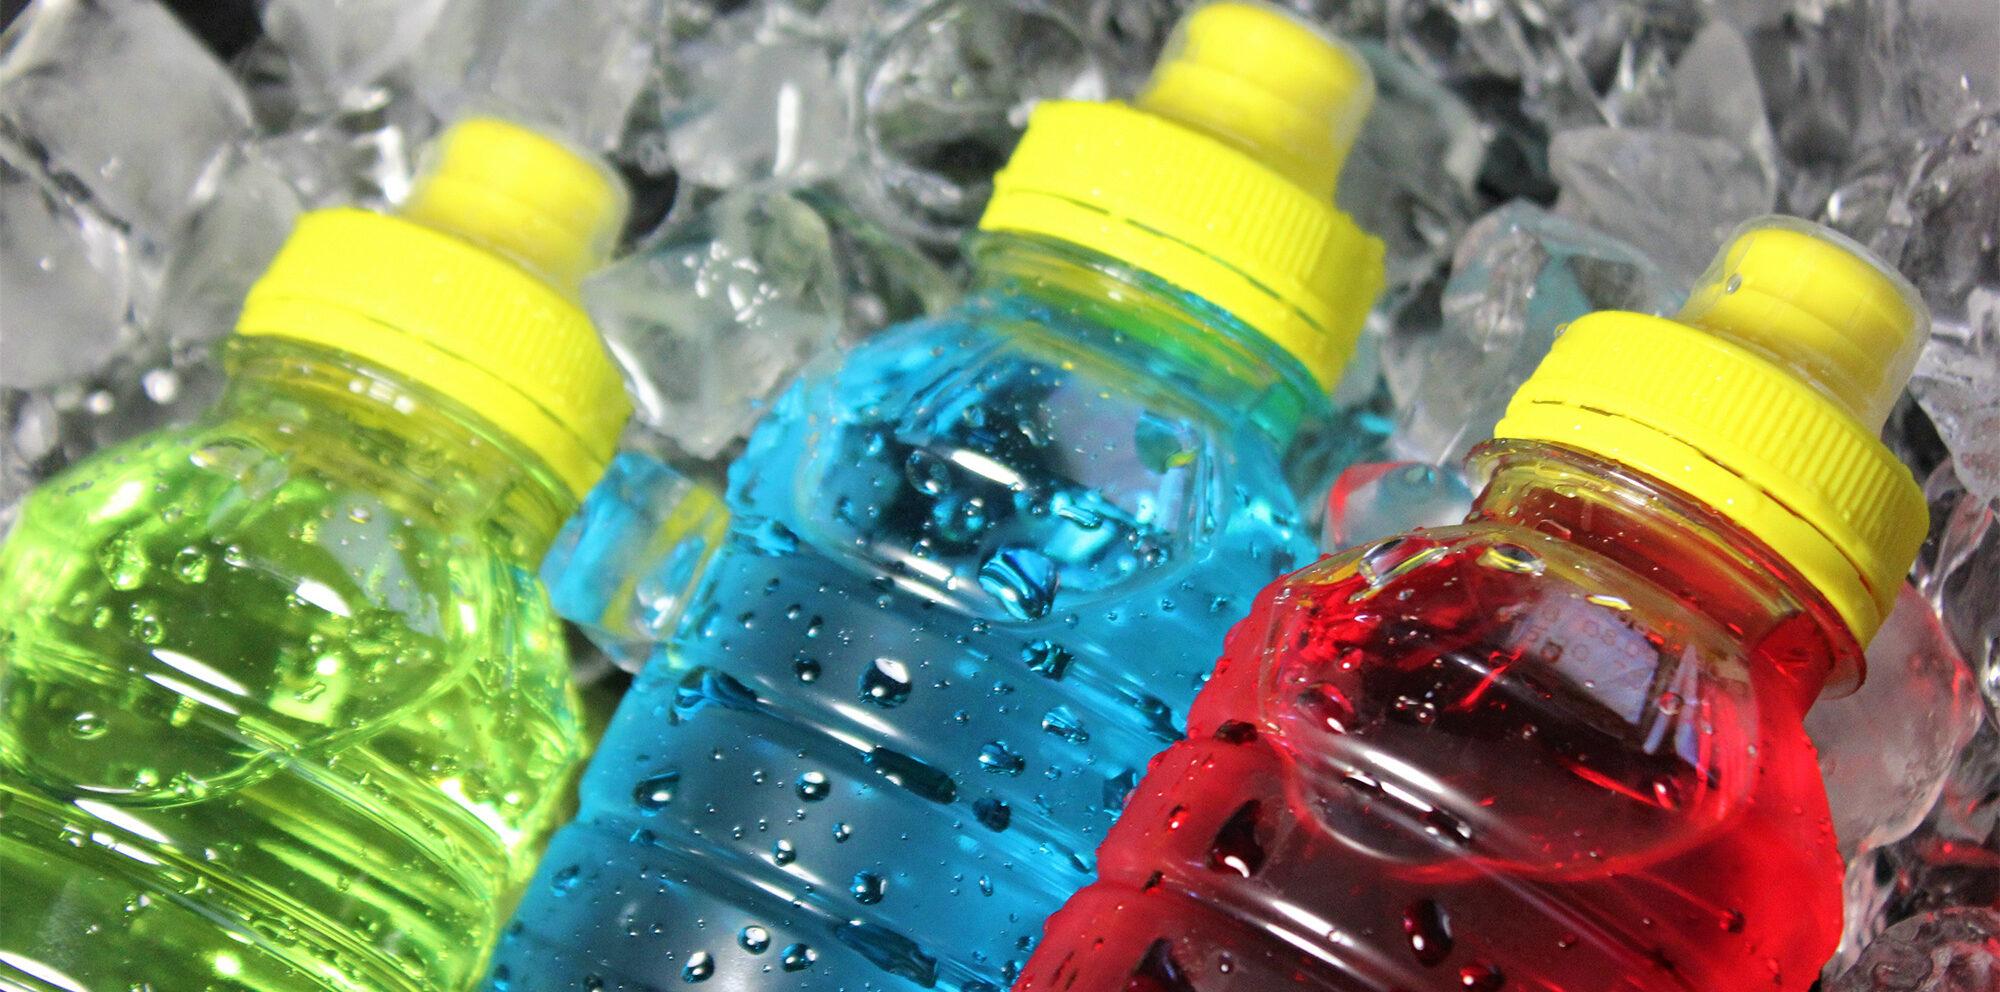 bottles with electrolytes